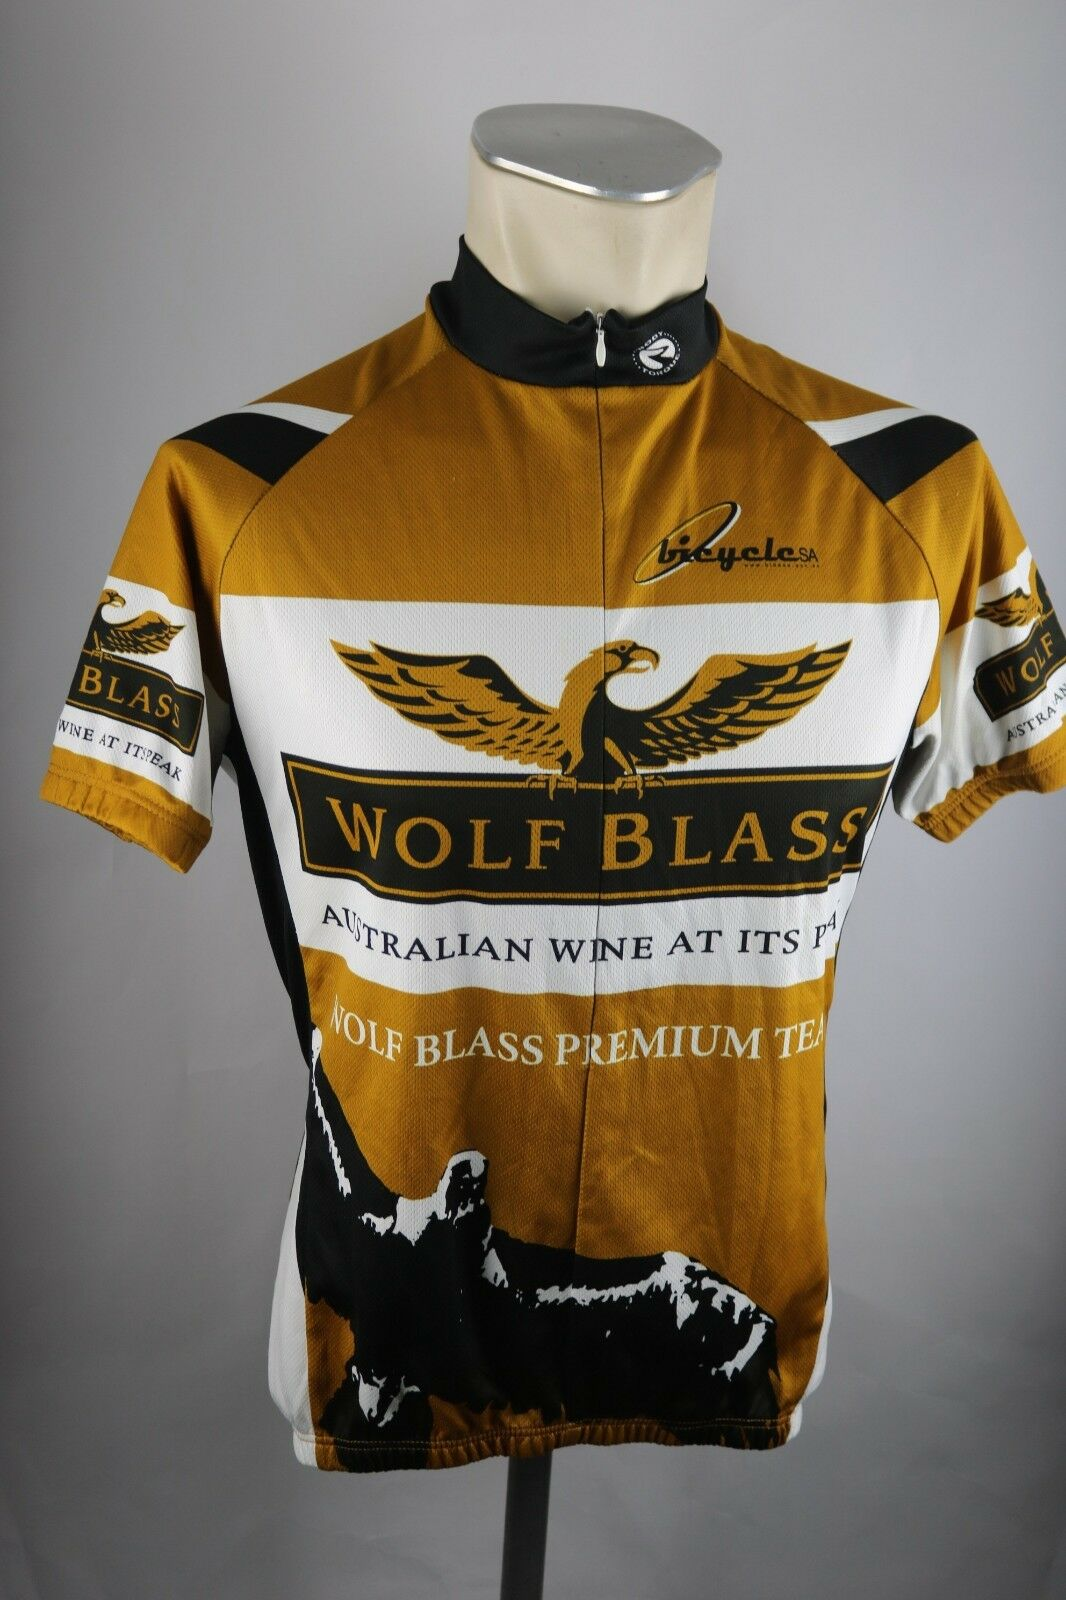 Wolff Blass Australia Wine Radtrikot Radtrikot Radtrikot Gr. M 52cm Bike cycling jersey Shirt F7 416ab3